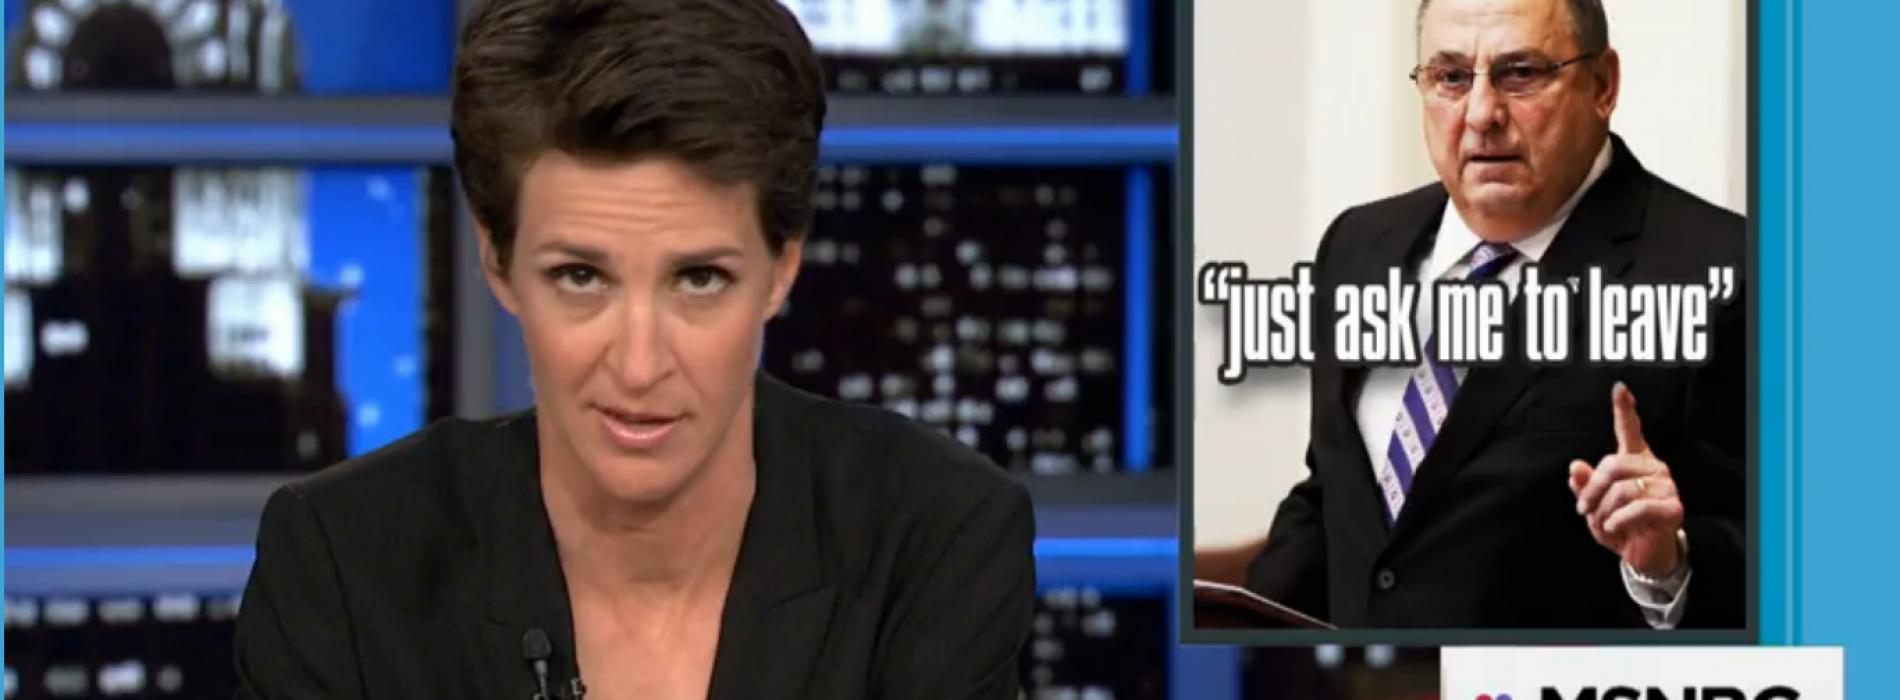 Rachel Maddow mocks Gov. LePage's offer to resign